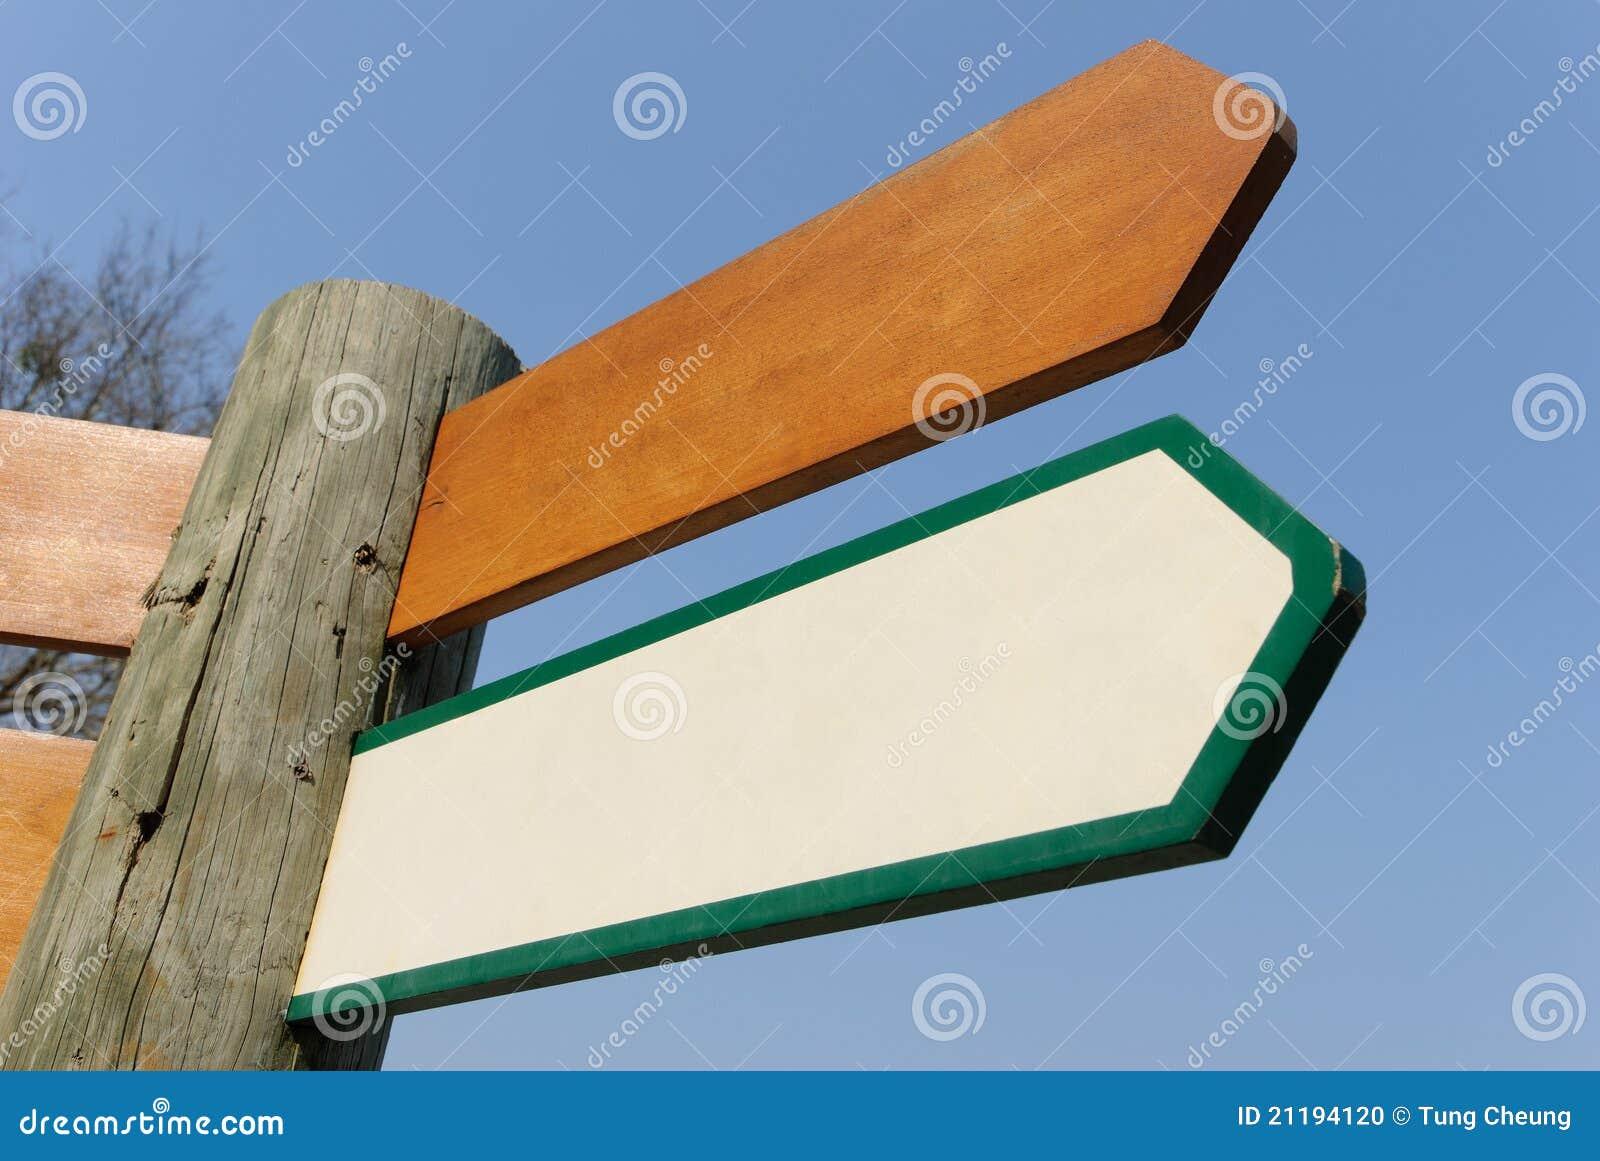 Empty wooden road sign